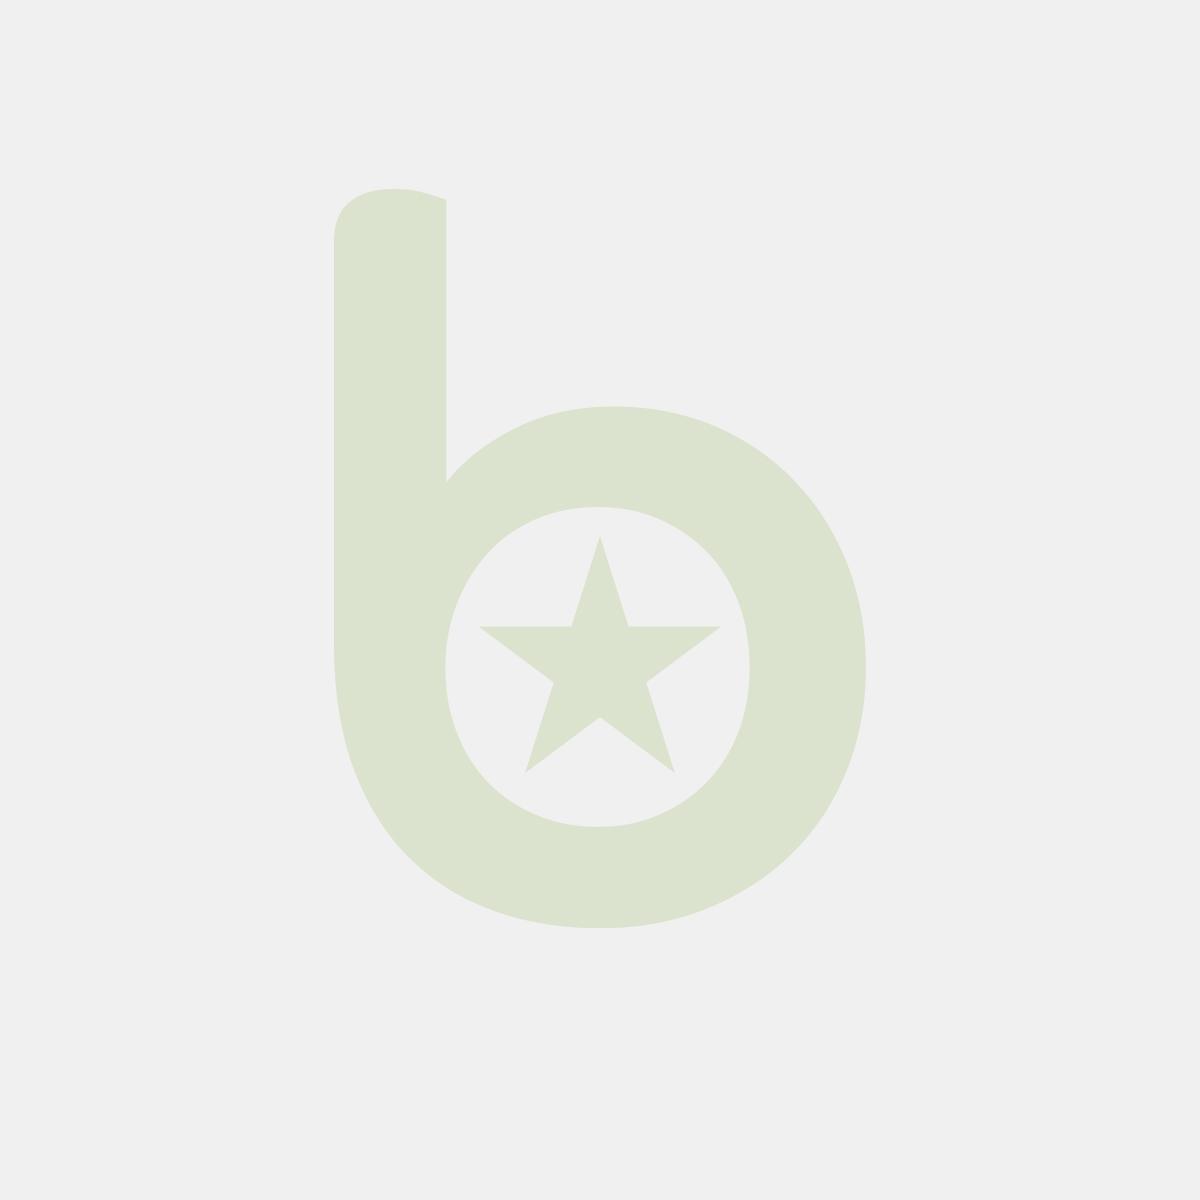 Gumki RUBBER LOOPS, 500szt., morskie